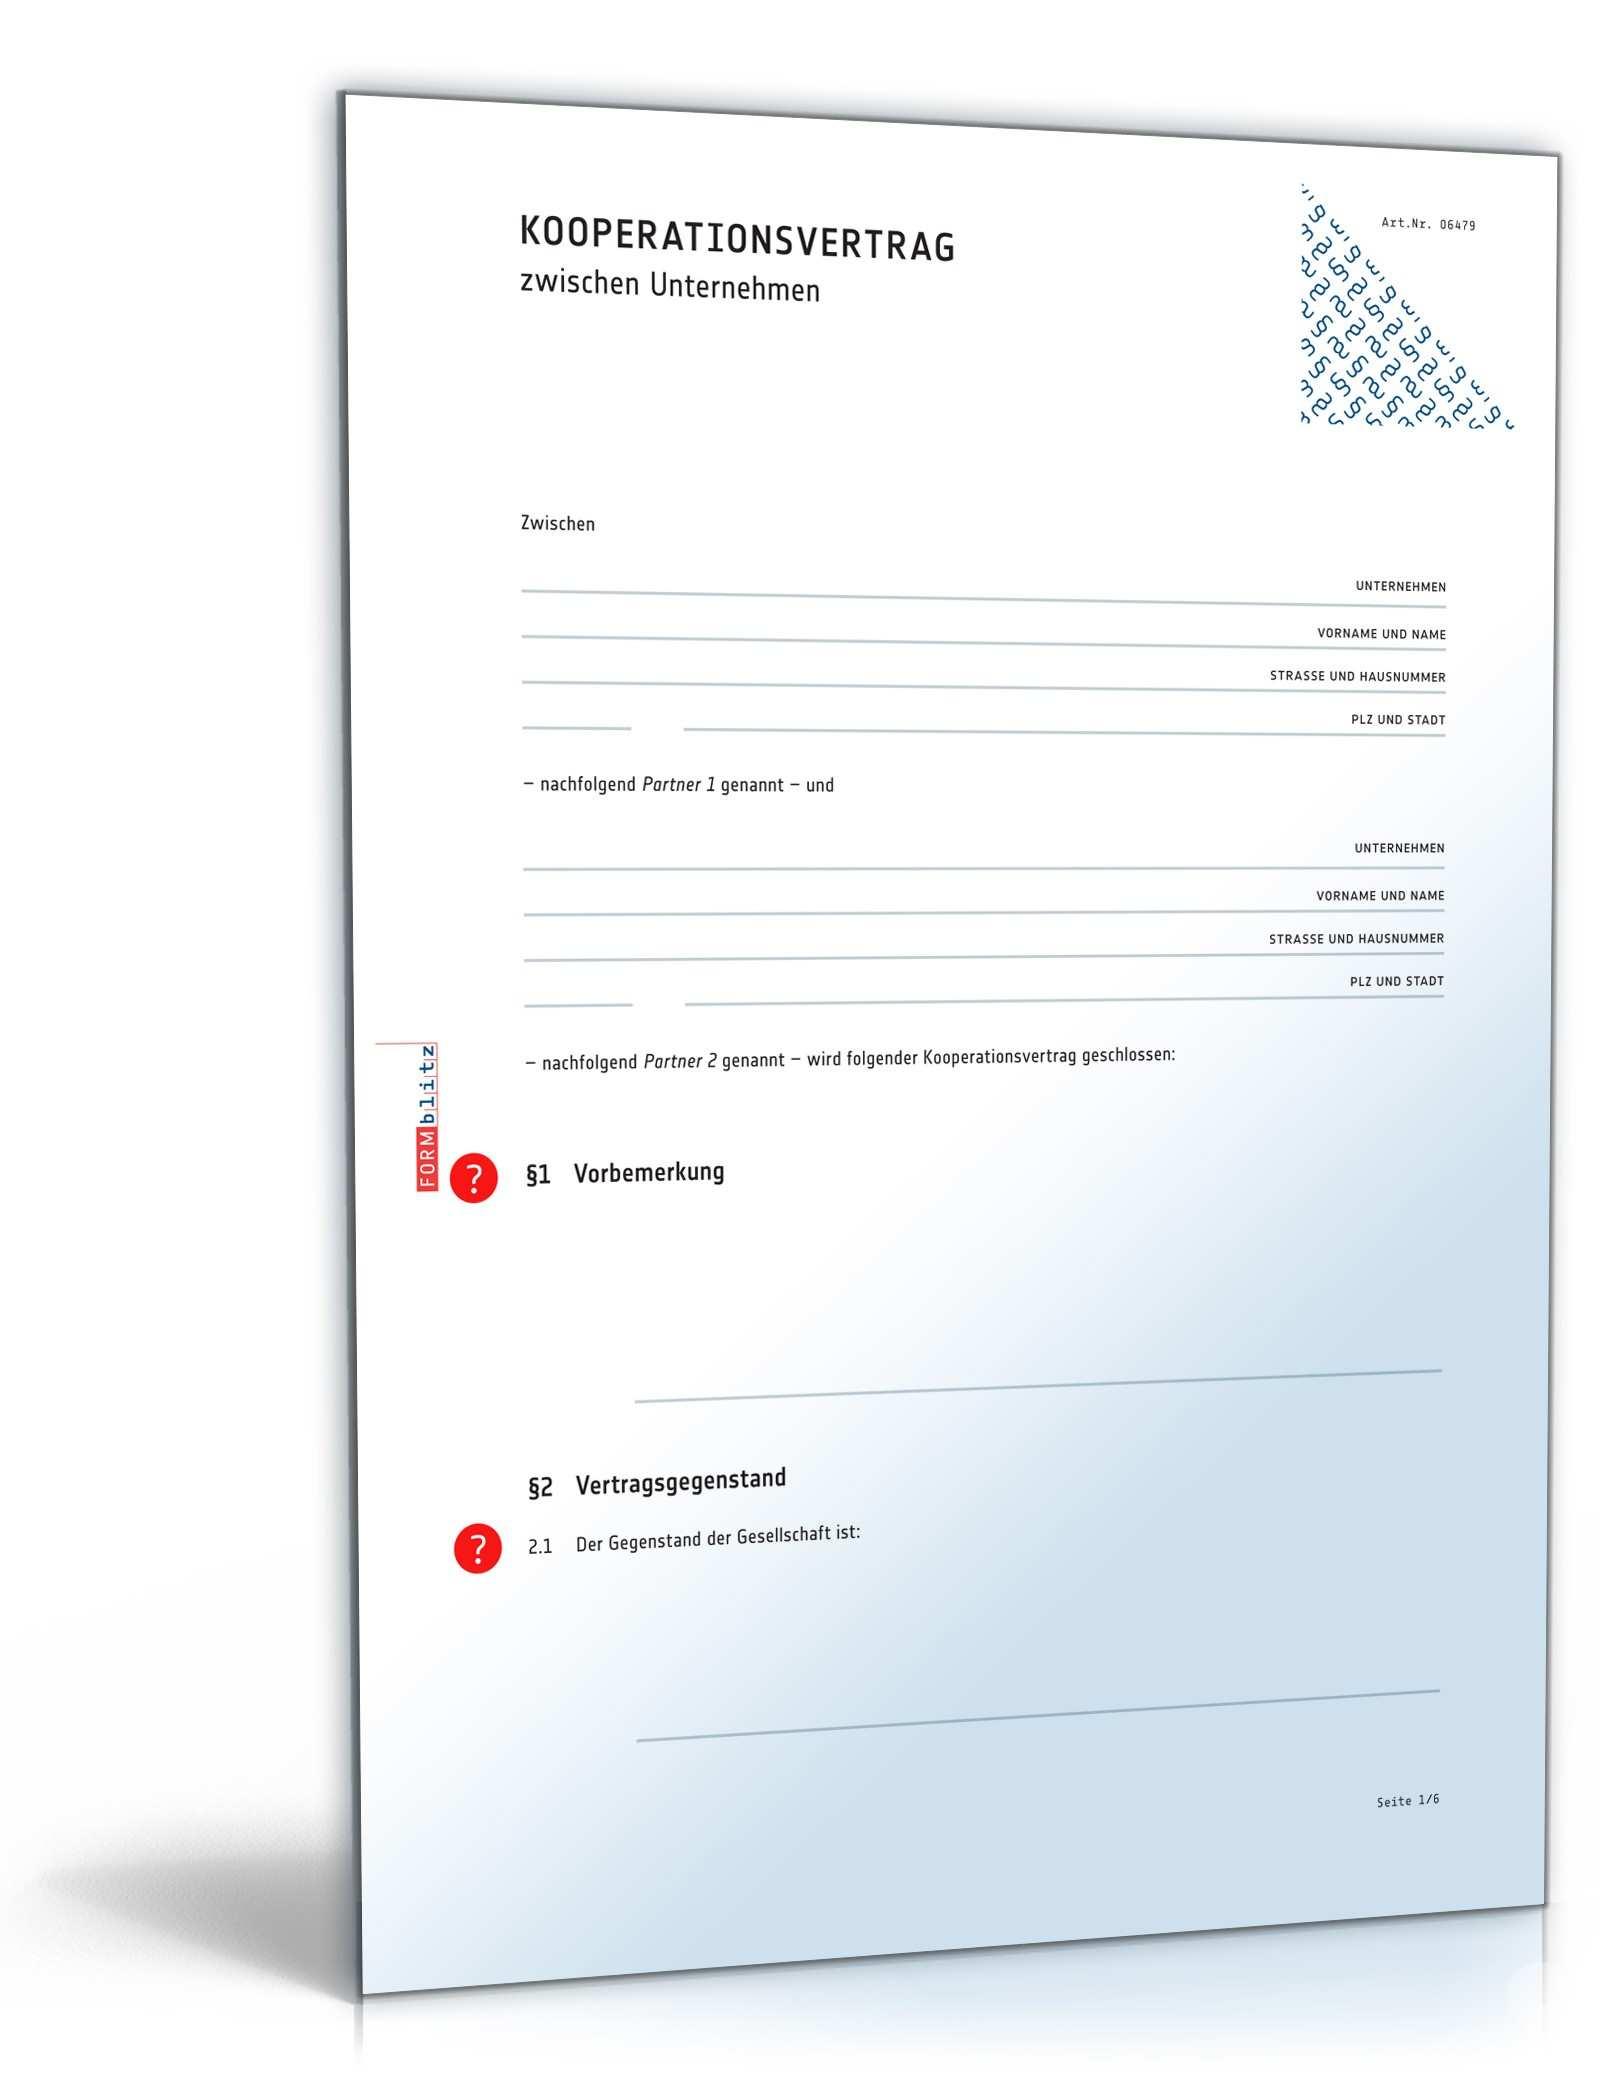 Kooperationsvertrag Muster Fur Kooperationen Von Firmen